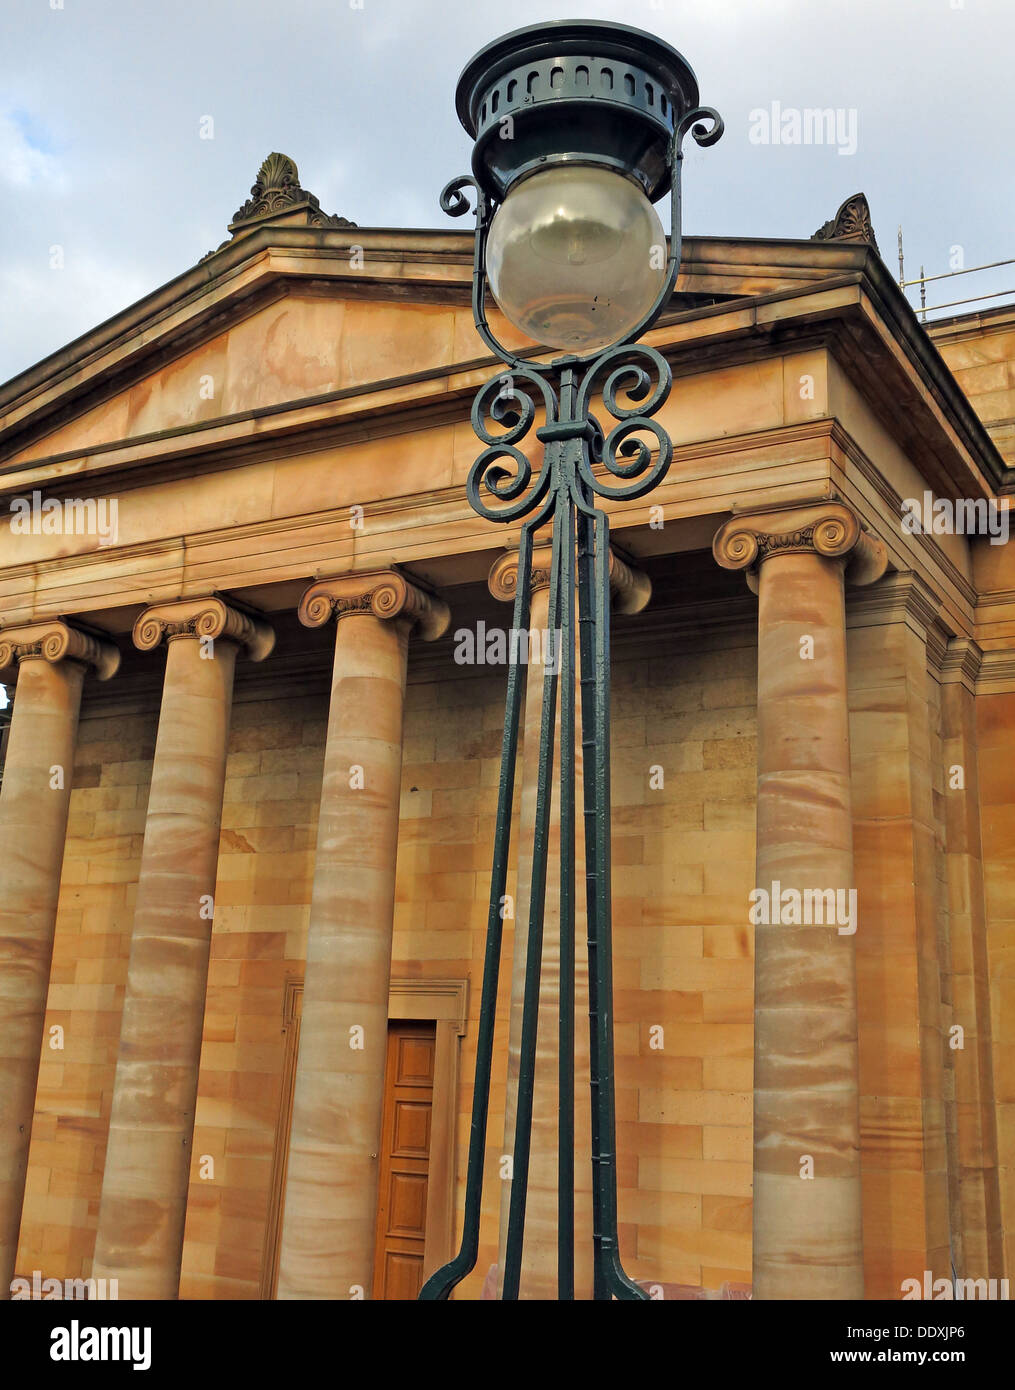 National Galleries of Scotland Edinburgh City, on the Mound, UK - Stock Image